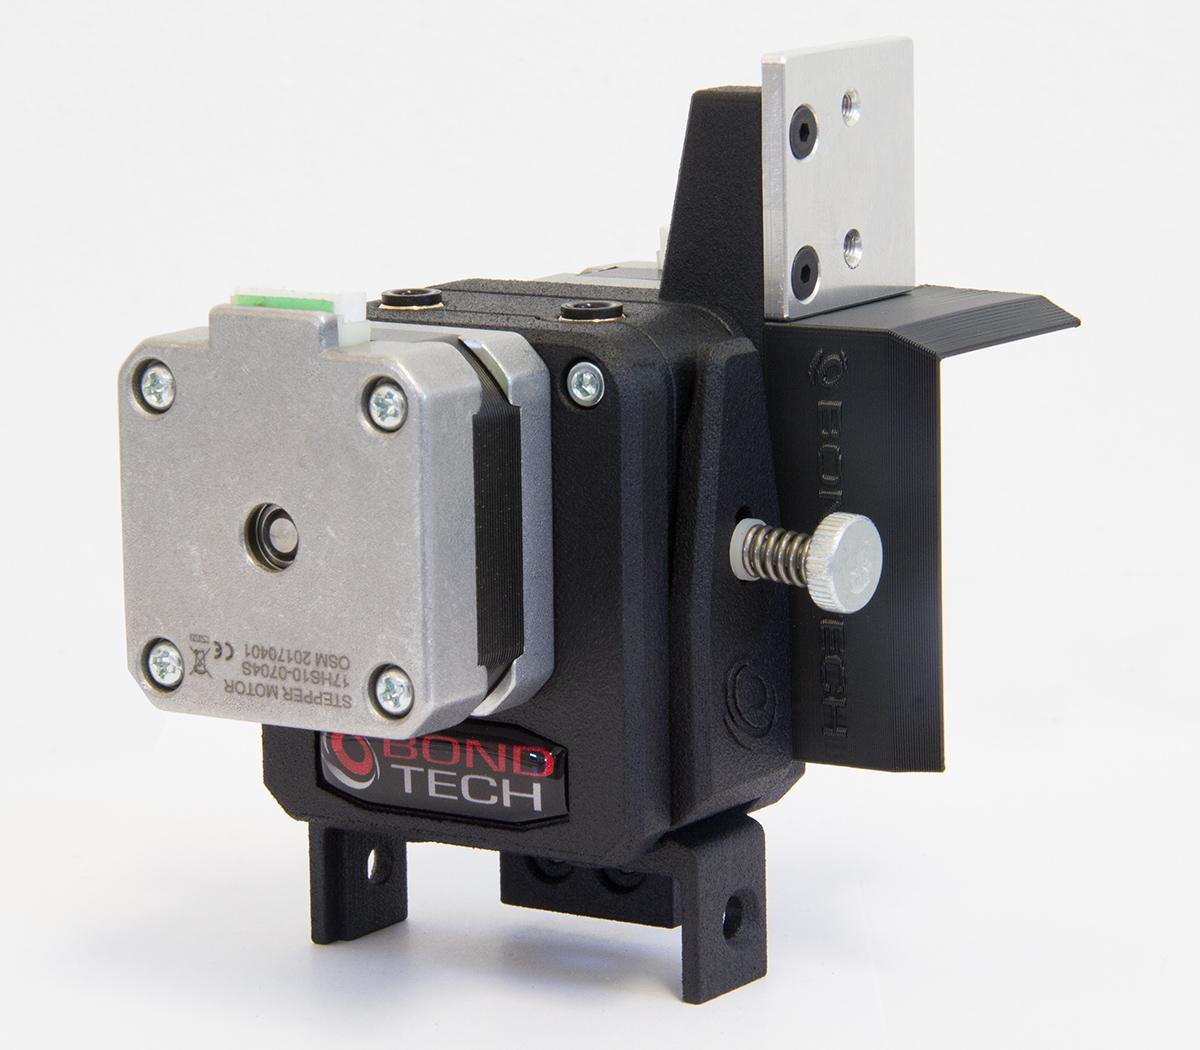 BondTech Raise3D DualDirect Upgrade PARTS Bondtech Upgrade